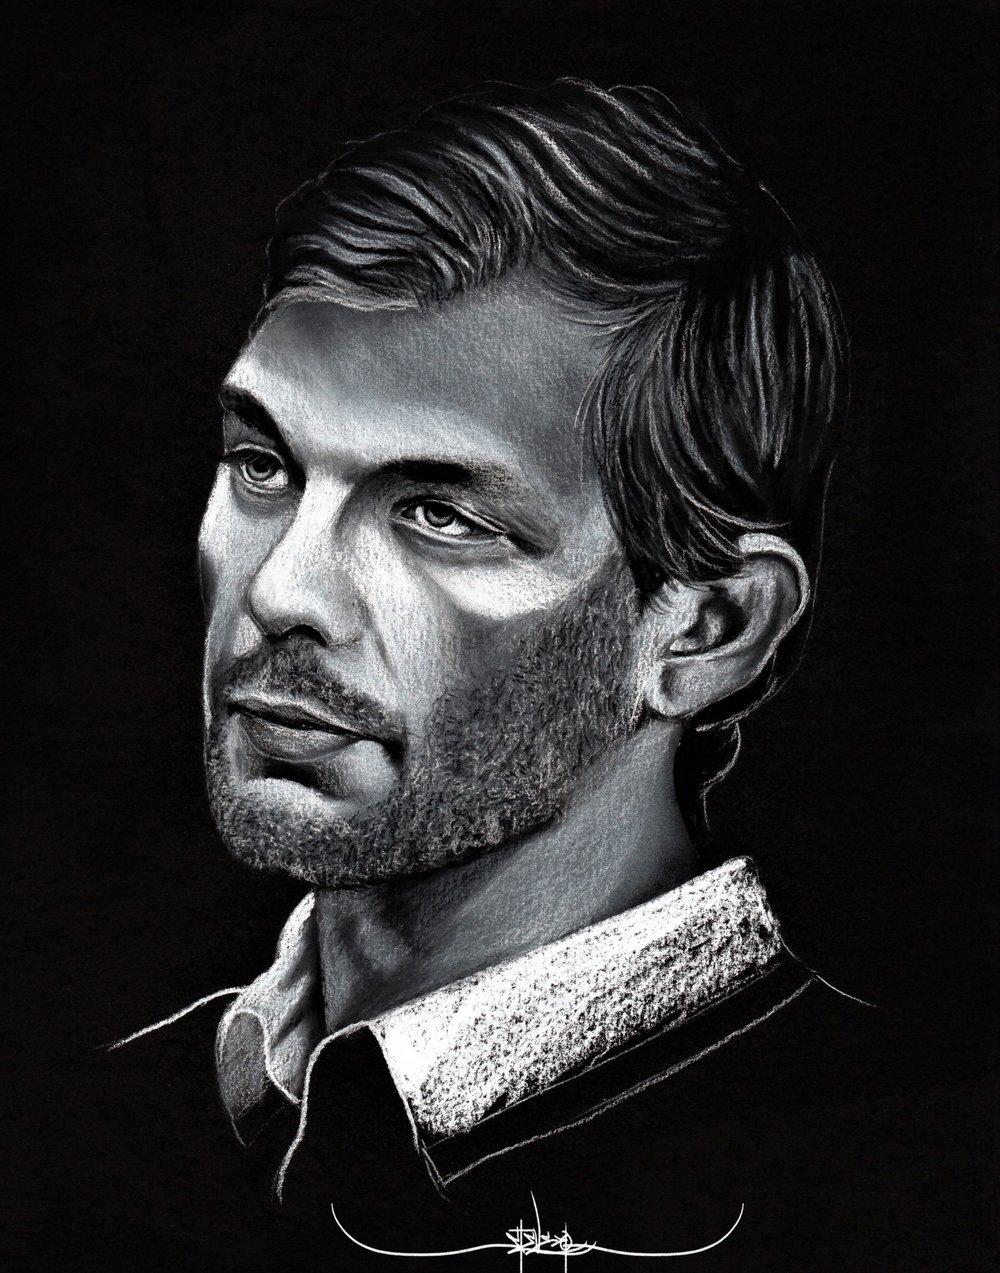 Dahmer 8x10 print